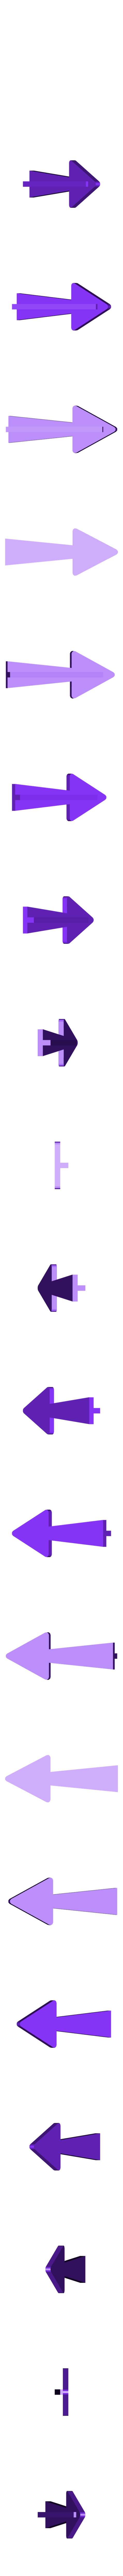 Panneau michelin triangle.stl Download STL file Panel michelin triangle • 3D print object, fanfy54